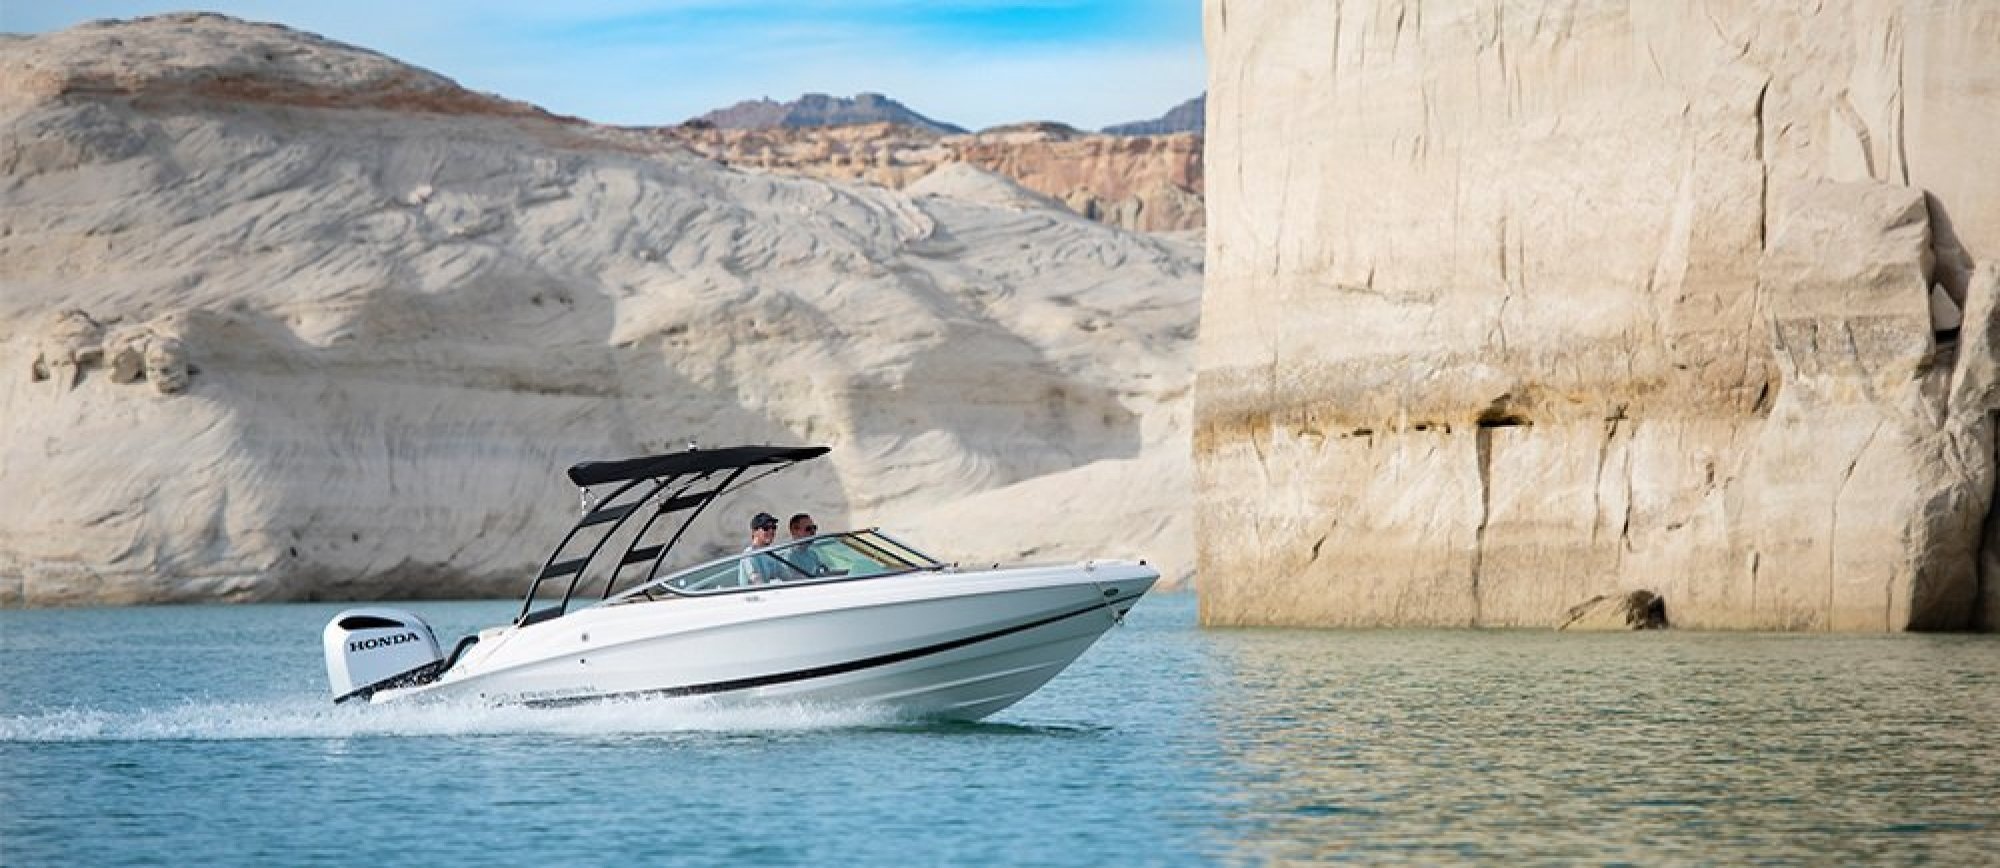 Brand New 21 ft Regal Powerboat Rental at Wahweap Marina